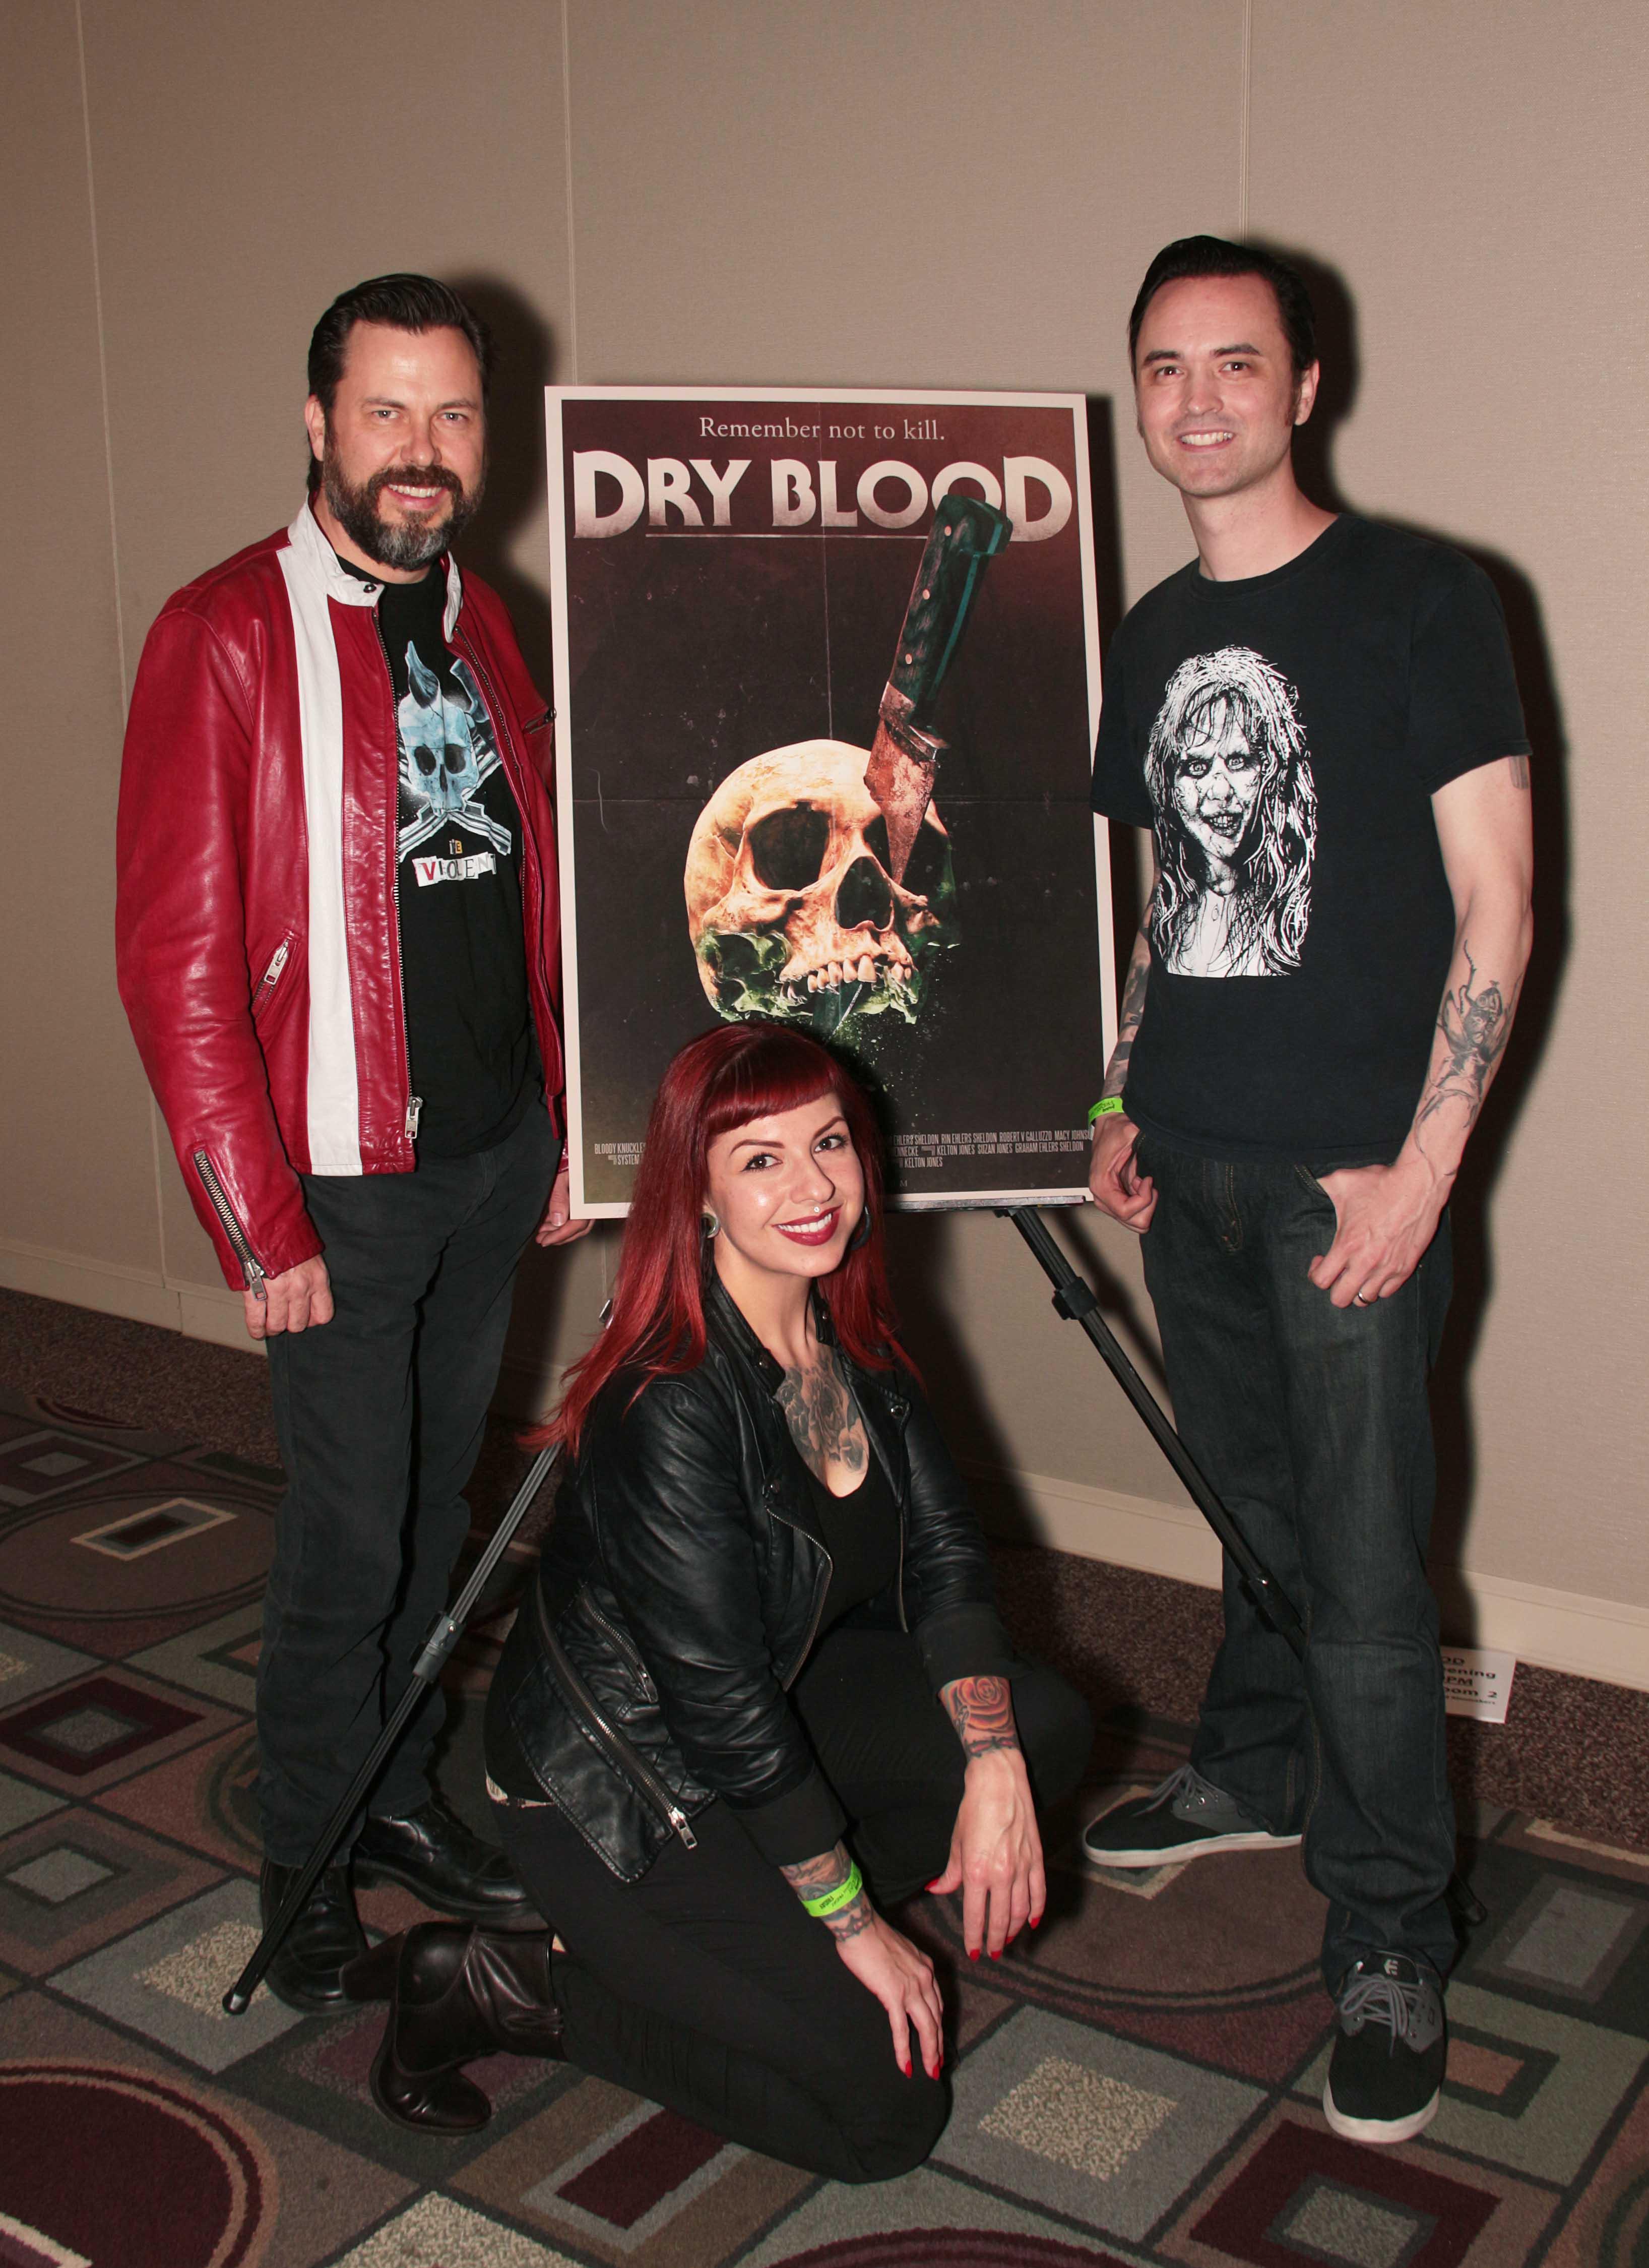 Kelton, Siuox, and Clint at Monsterpalooza